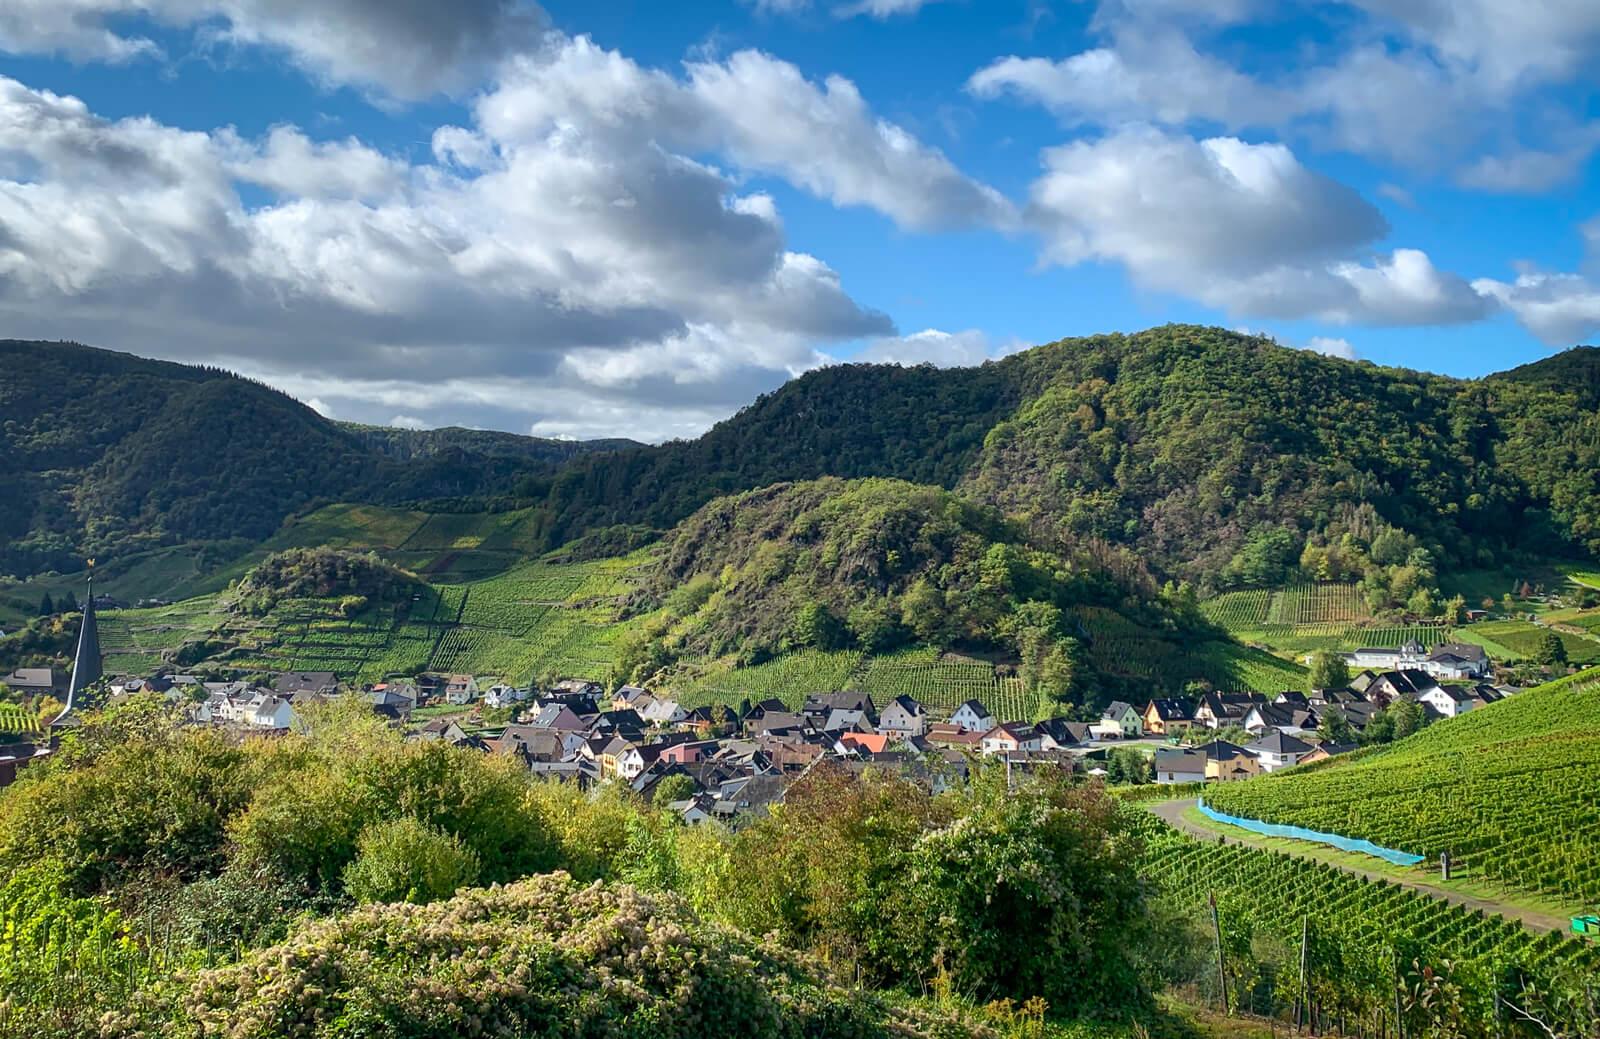 Looking over the village of Mayschoß (Mayschoss) in Western Ahr.